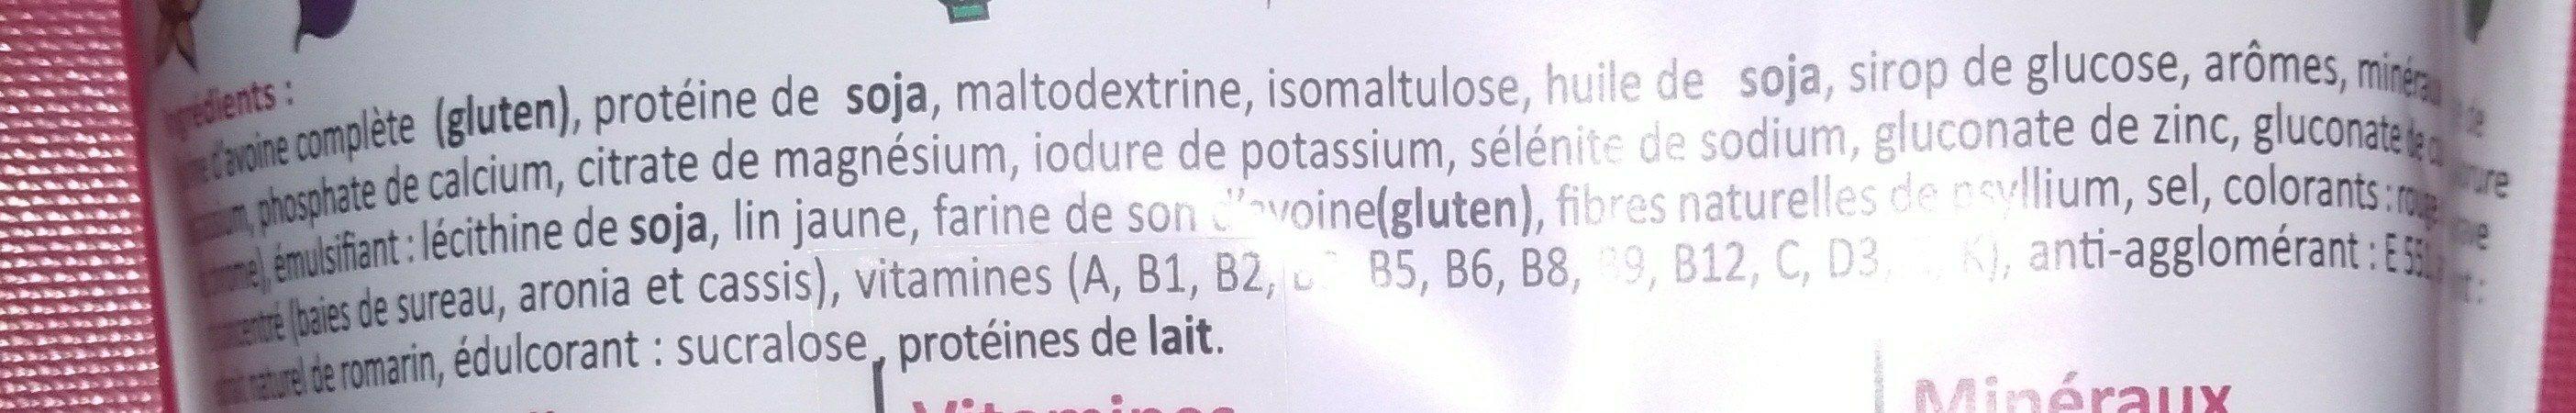 Smeal saveur fruits des bois - Ingredients